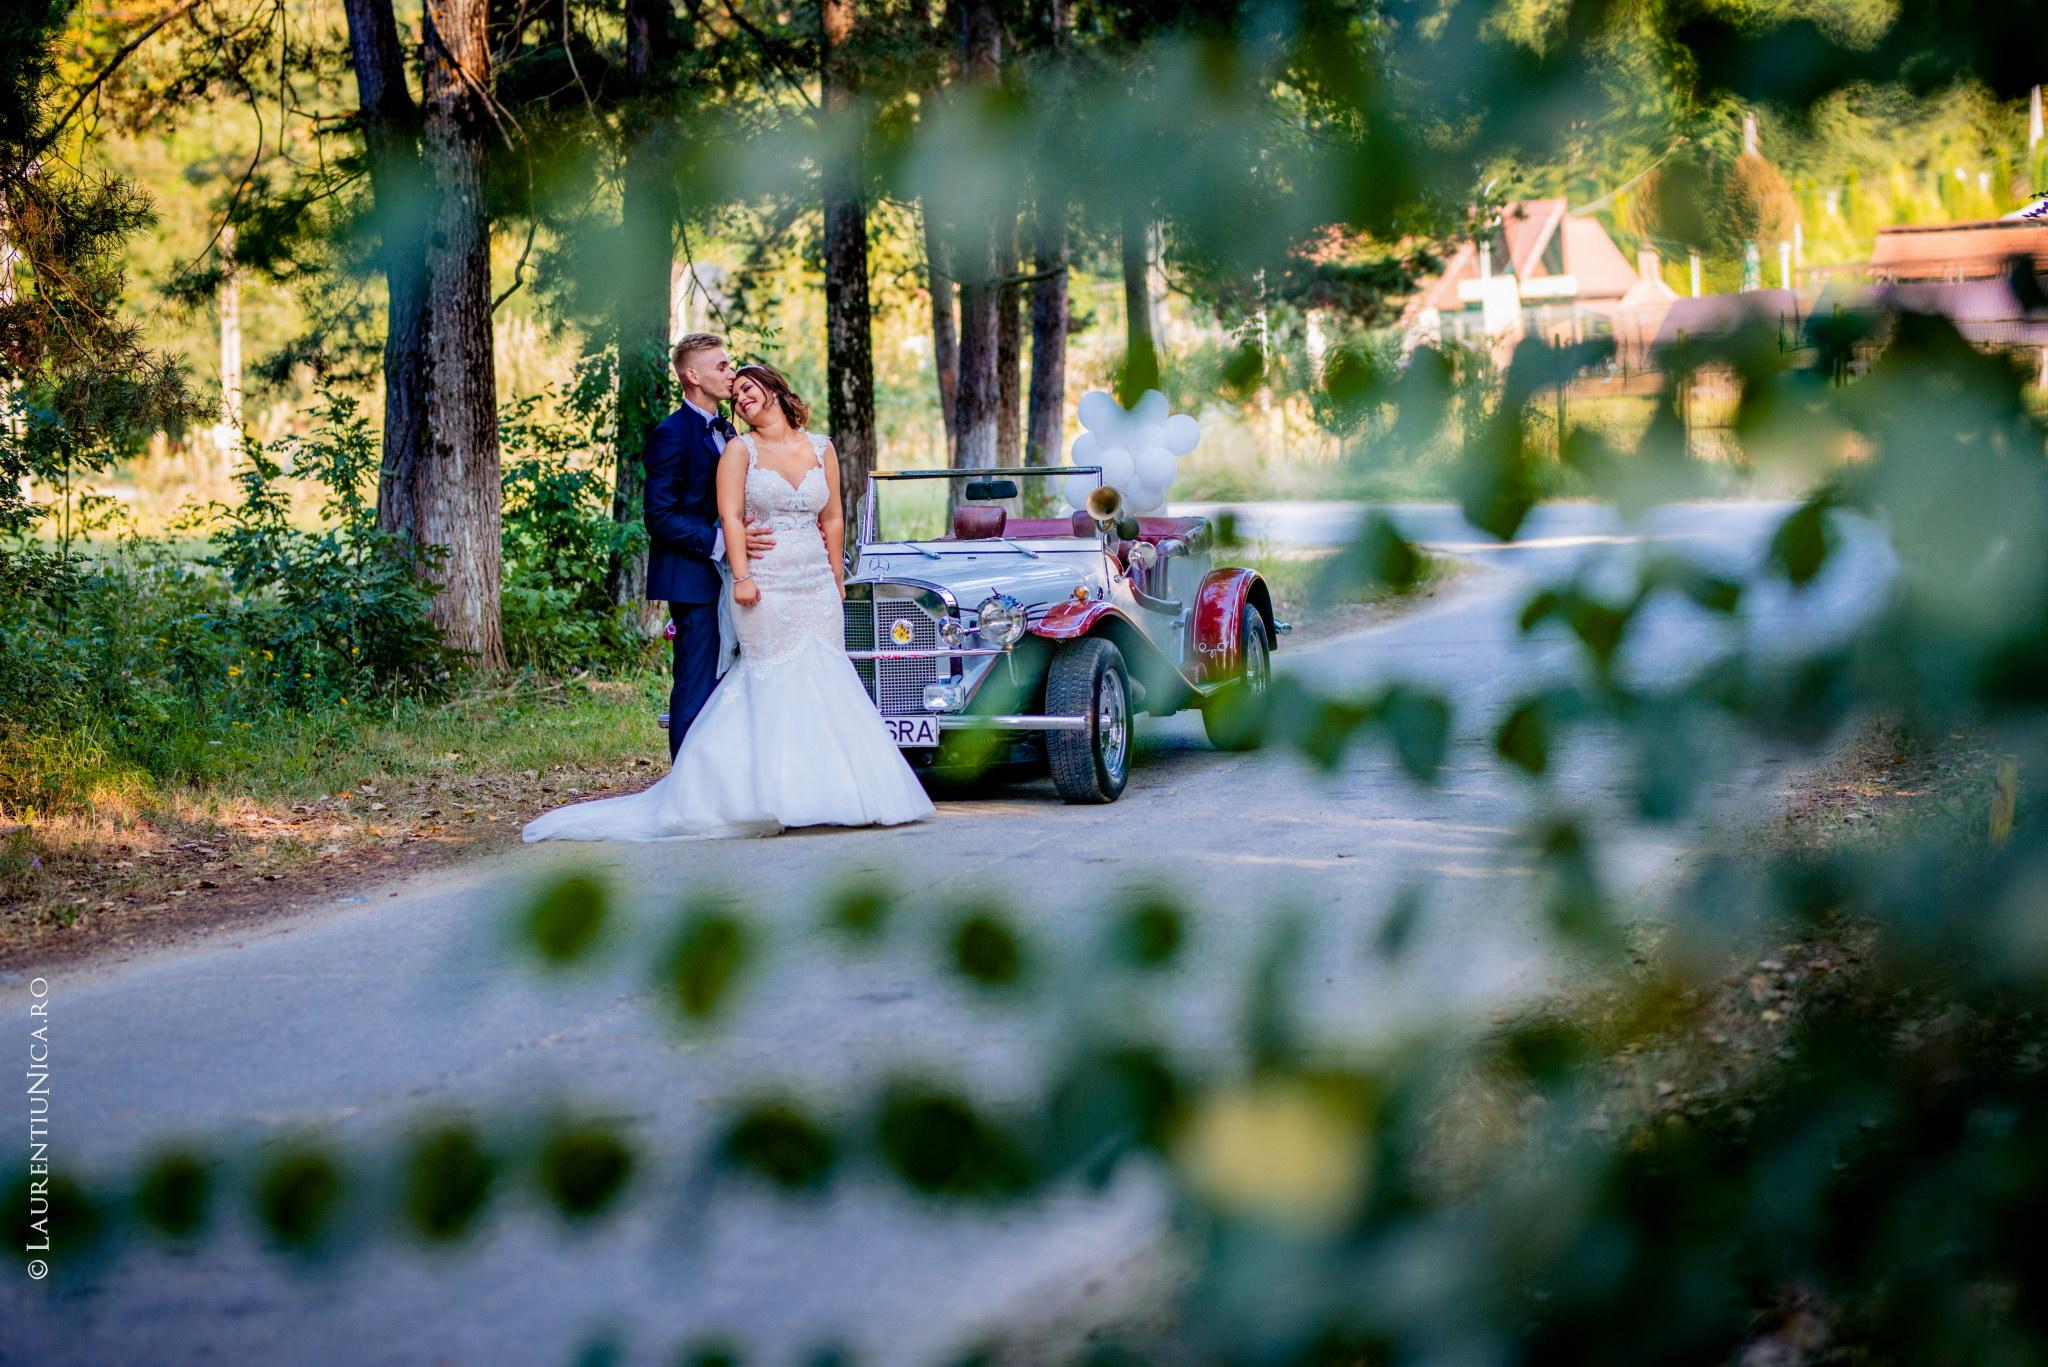 fotografii nunta Roxana si Cosmin fotograf nunta laurentiu nica 24 - Roxana & Cosmin | Fotografii nunta | Ticleni, judetul Gorj